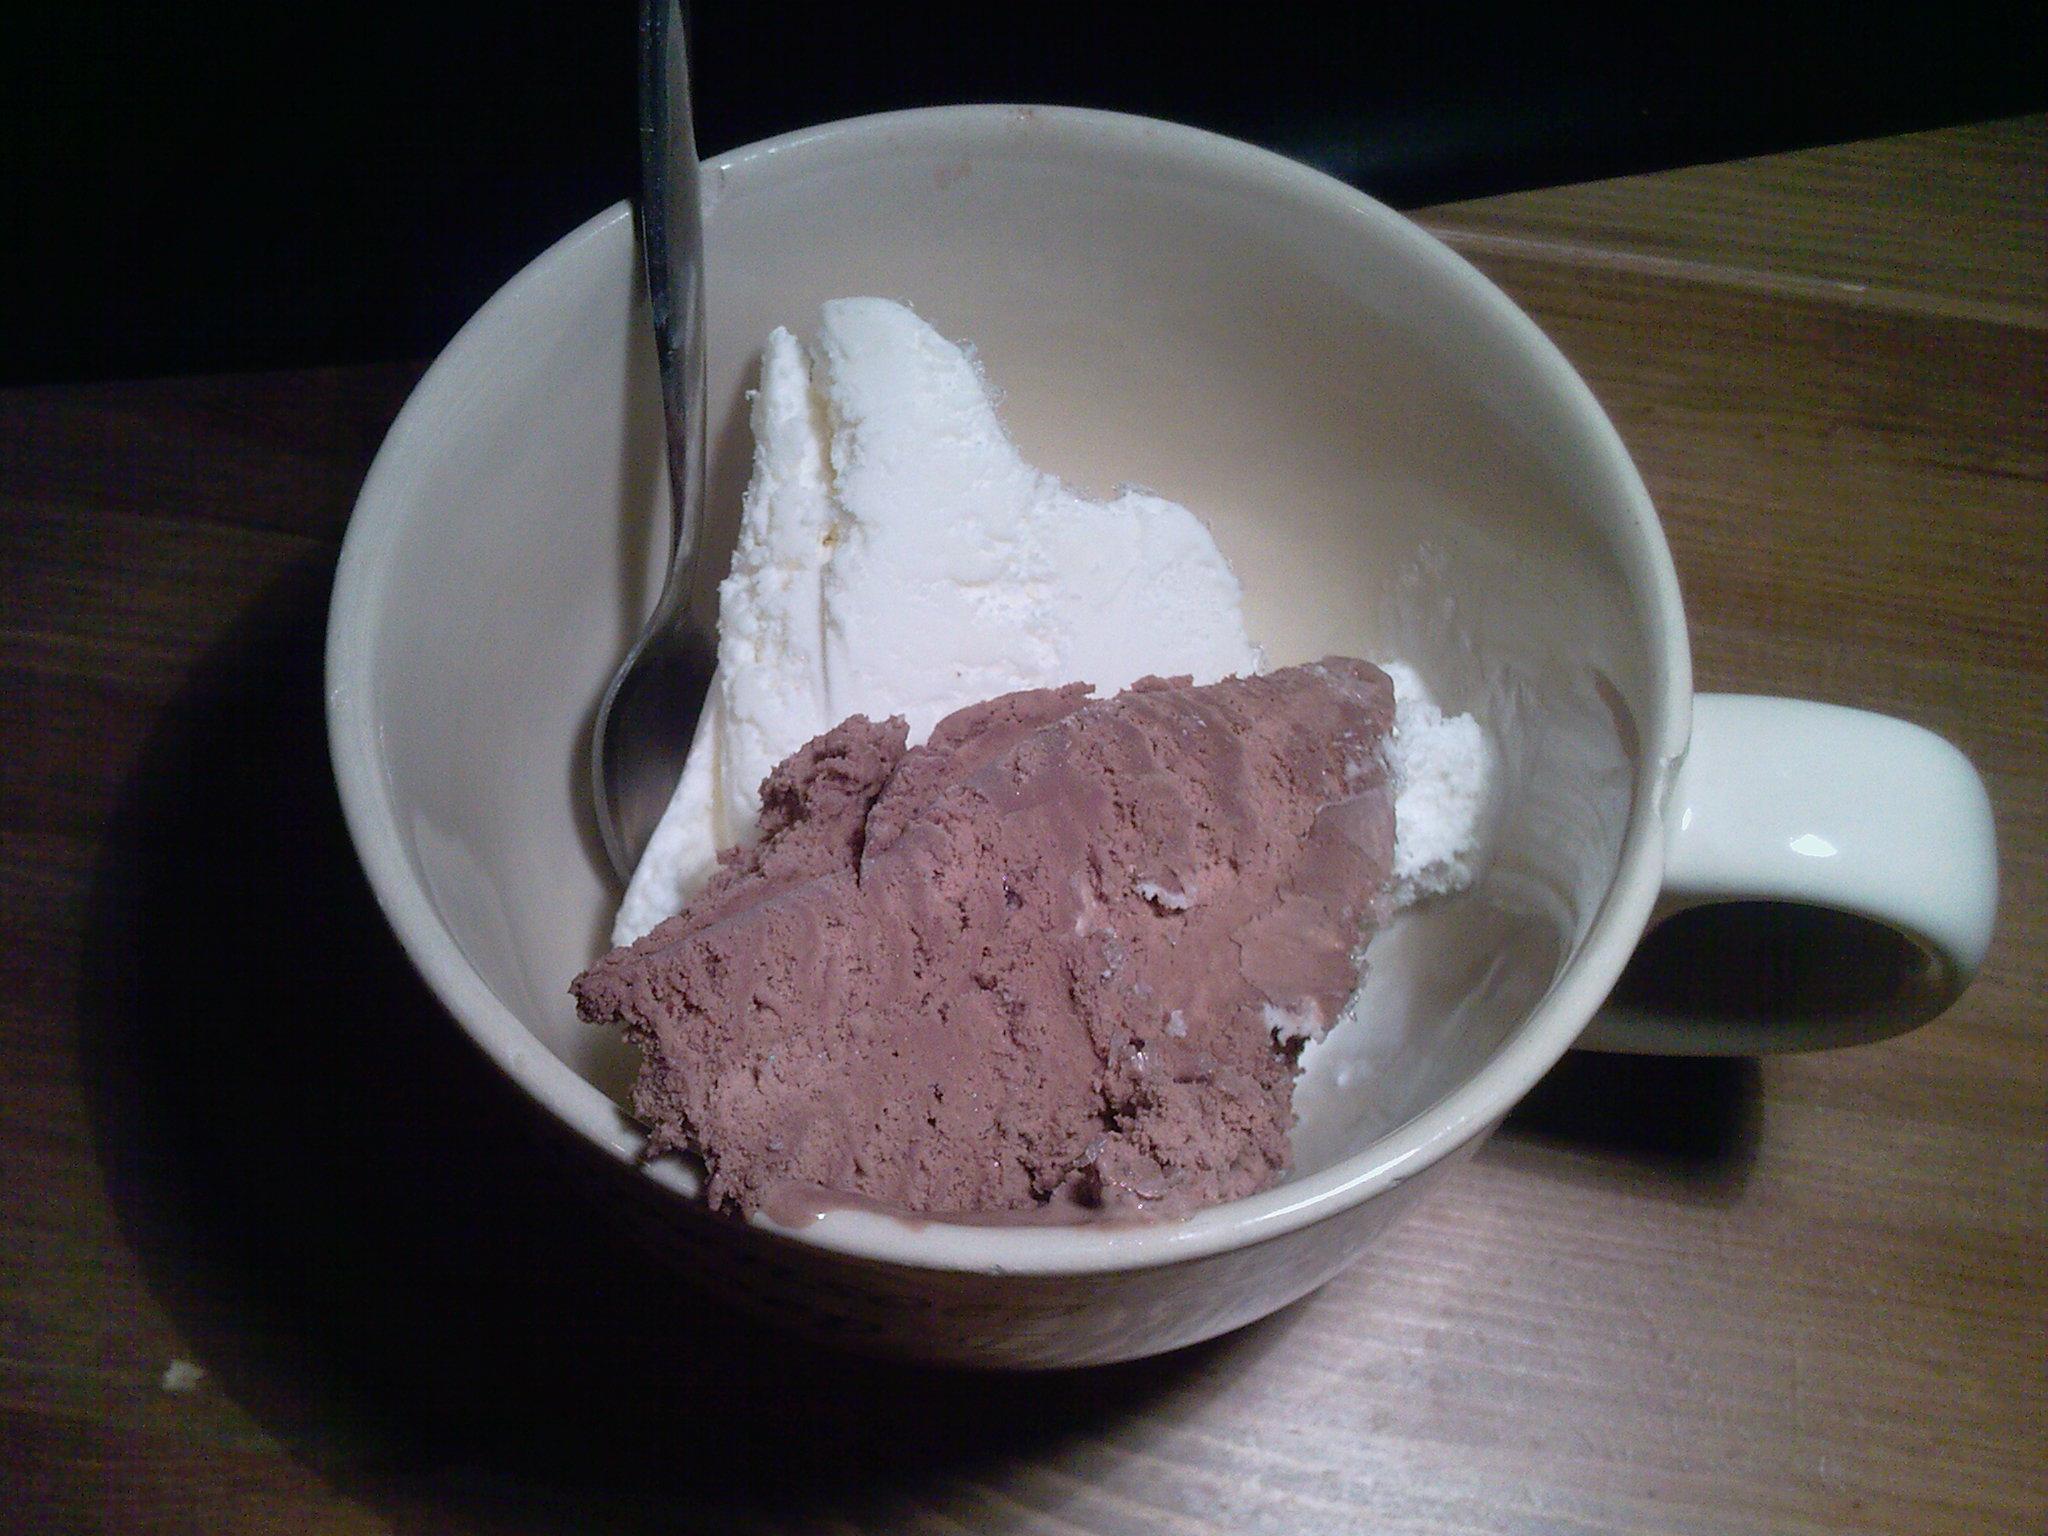 https://foodloader.net/wcbrilman_2010-04-27_chocolade_vanille_ice.jpg